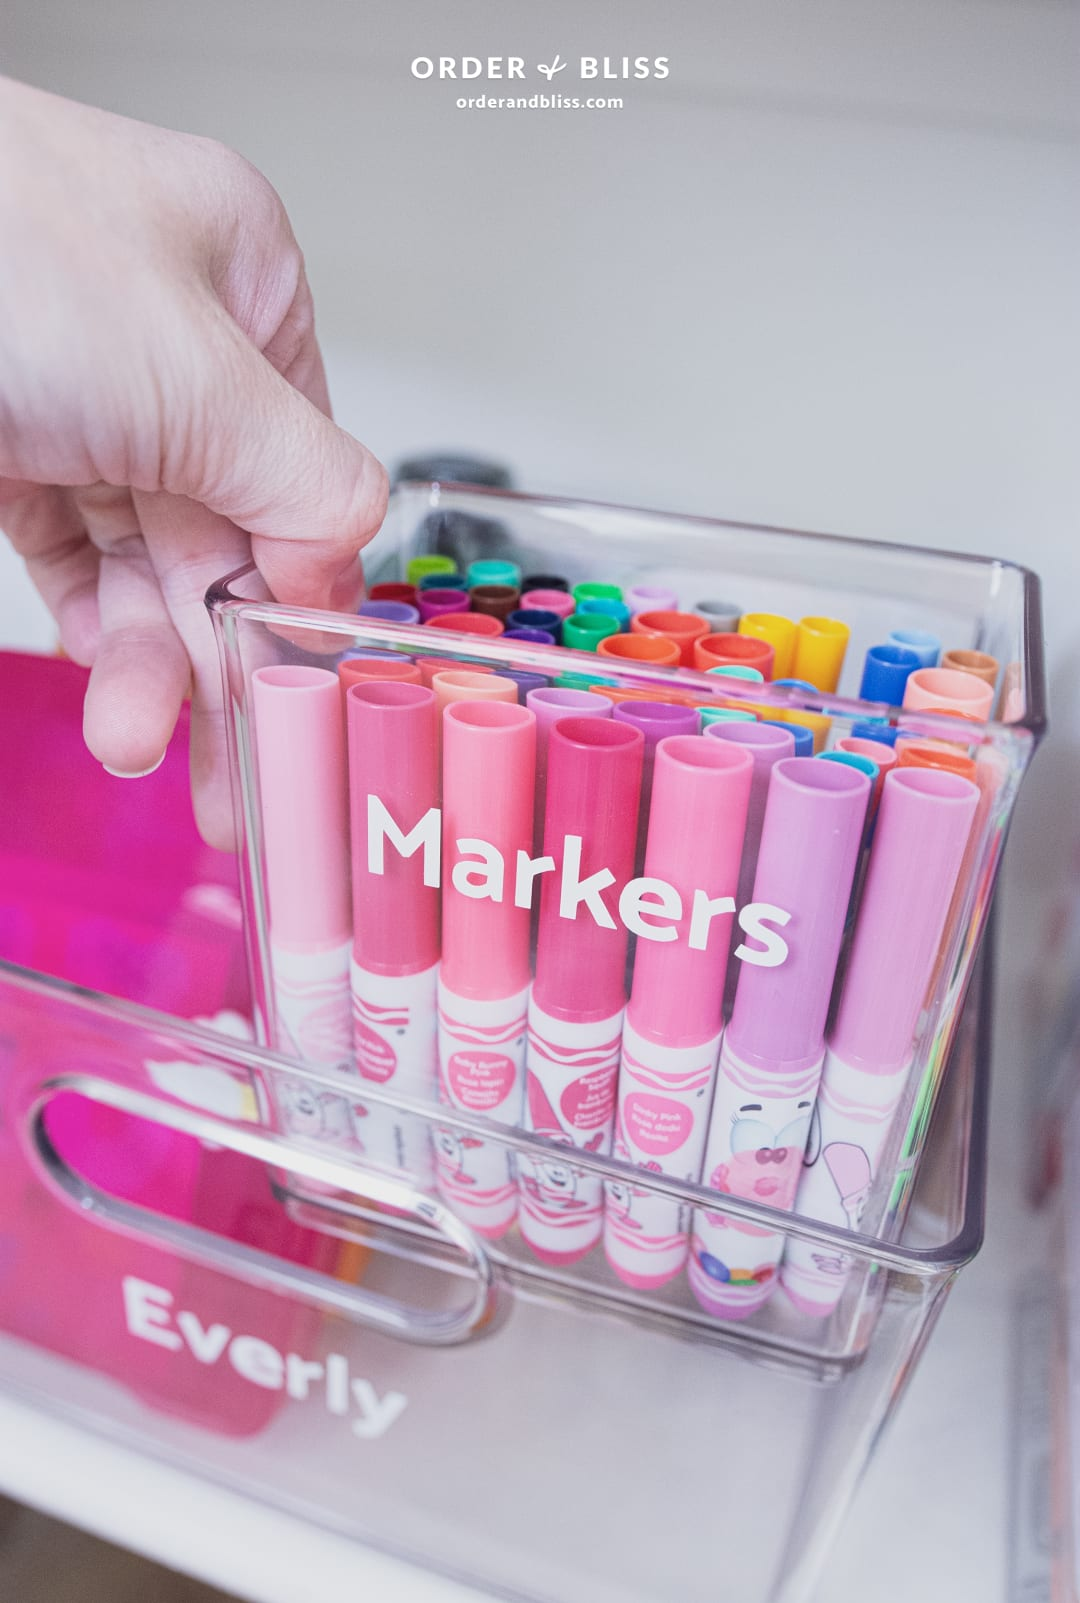 Crayola markers in a clear organizing bin